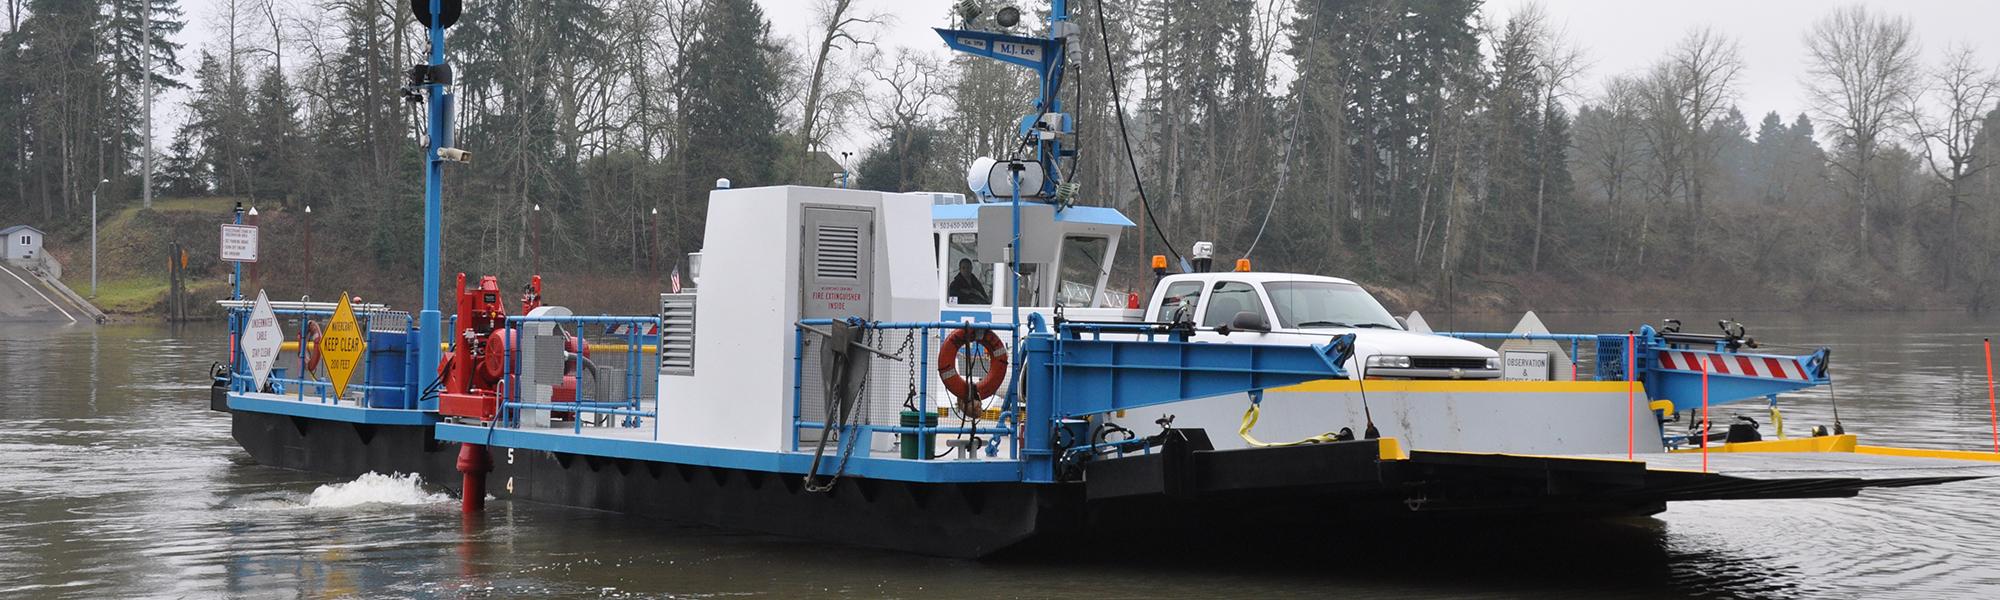 Canby Ferry Alternatives Feasibility Study Clackamas County